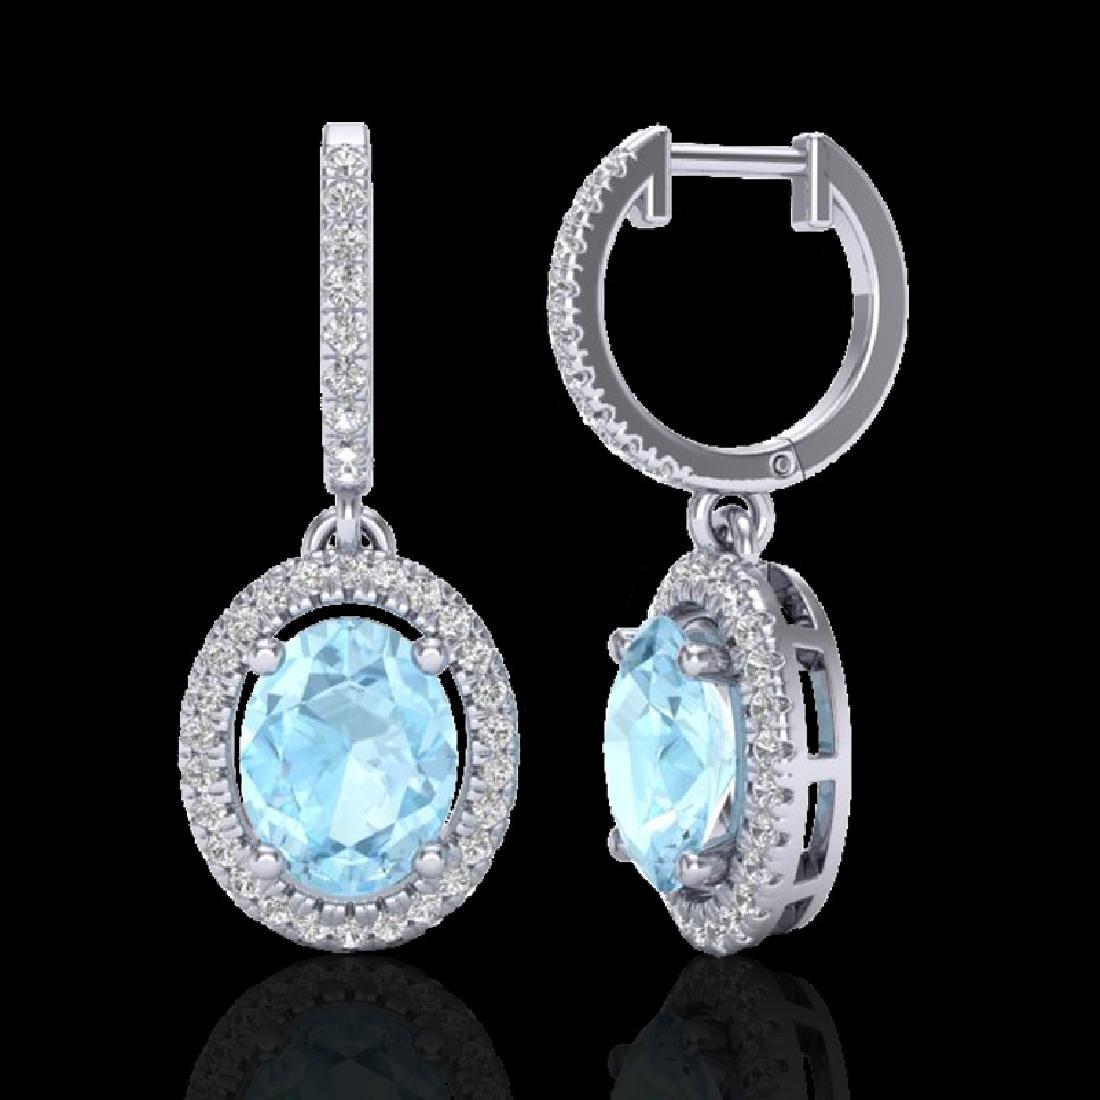 3.25 CTW Aquamarine & Micro Pave VS/SI Diamond Earrings - 2